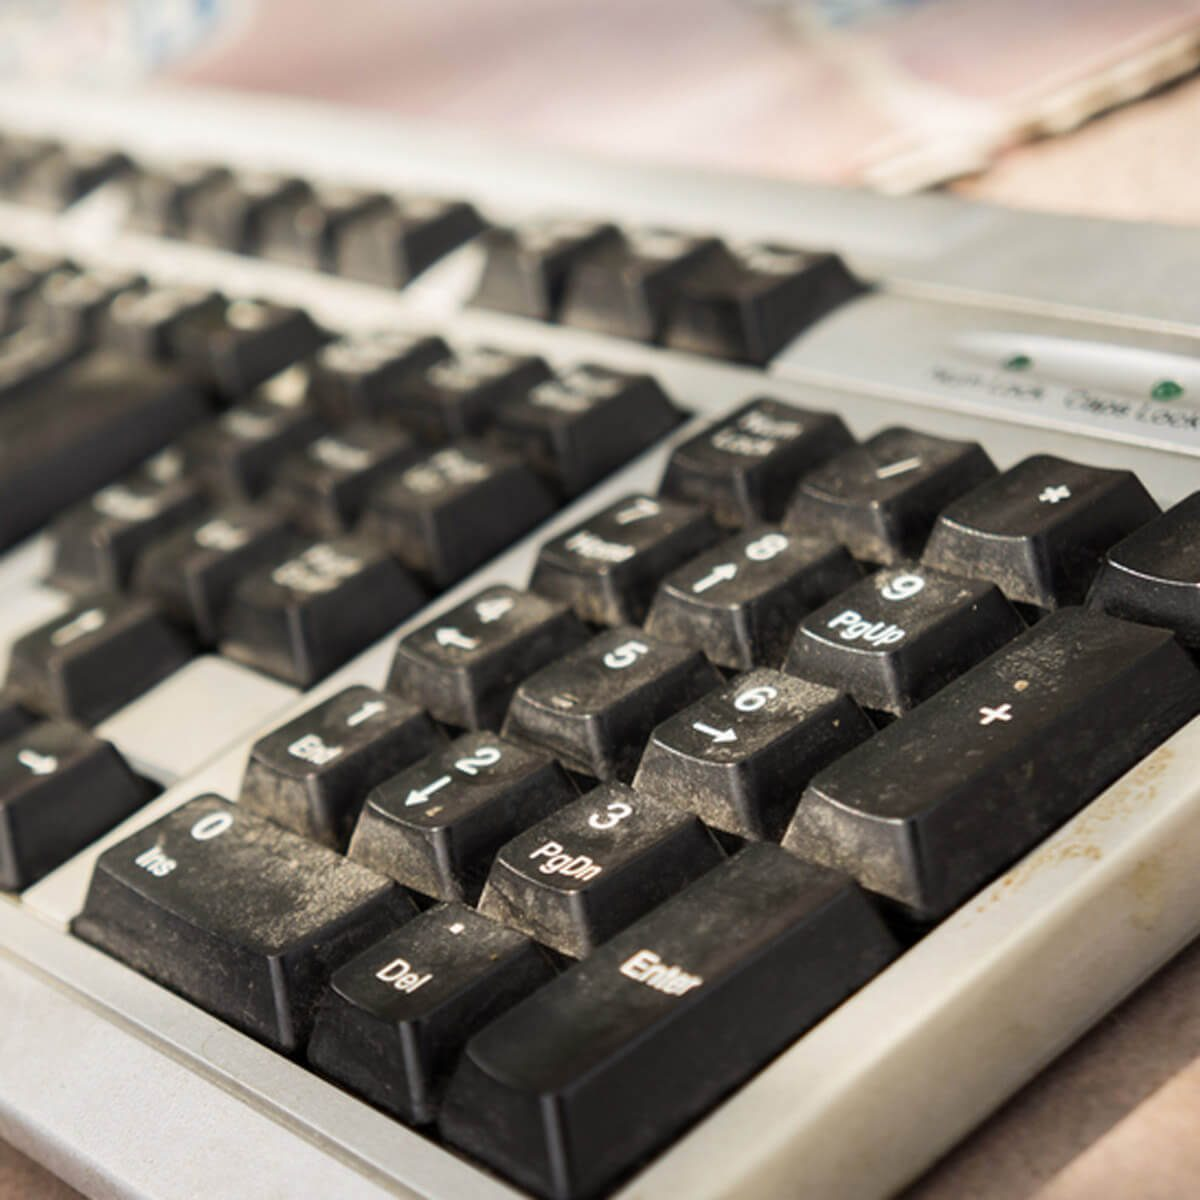 dirty dusty keyboard